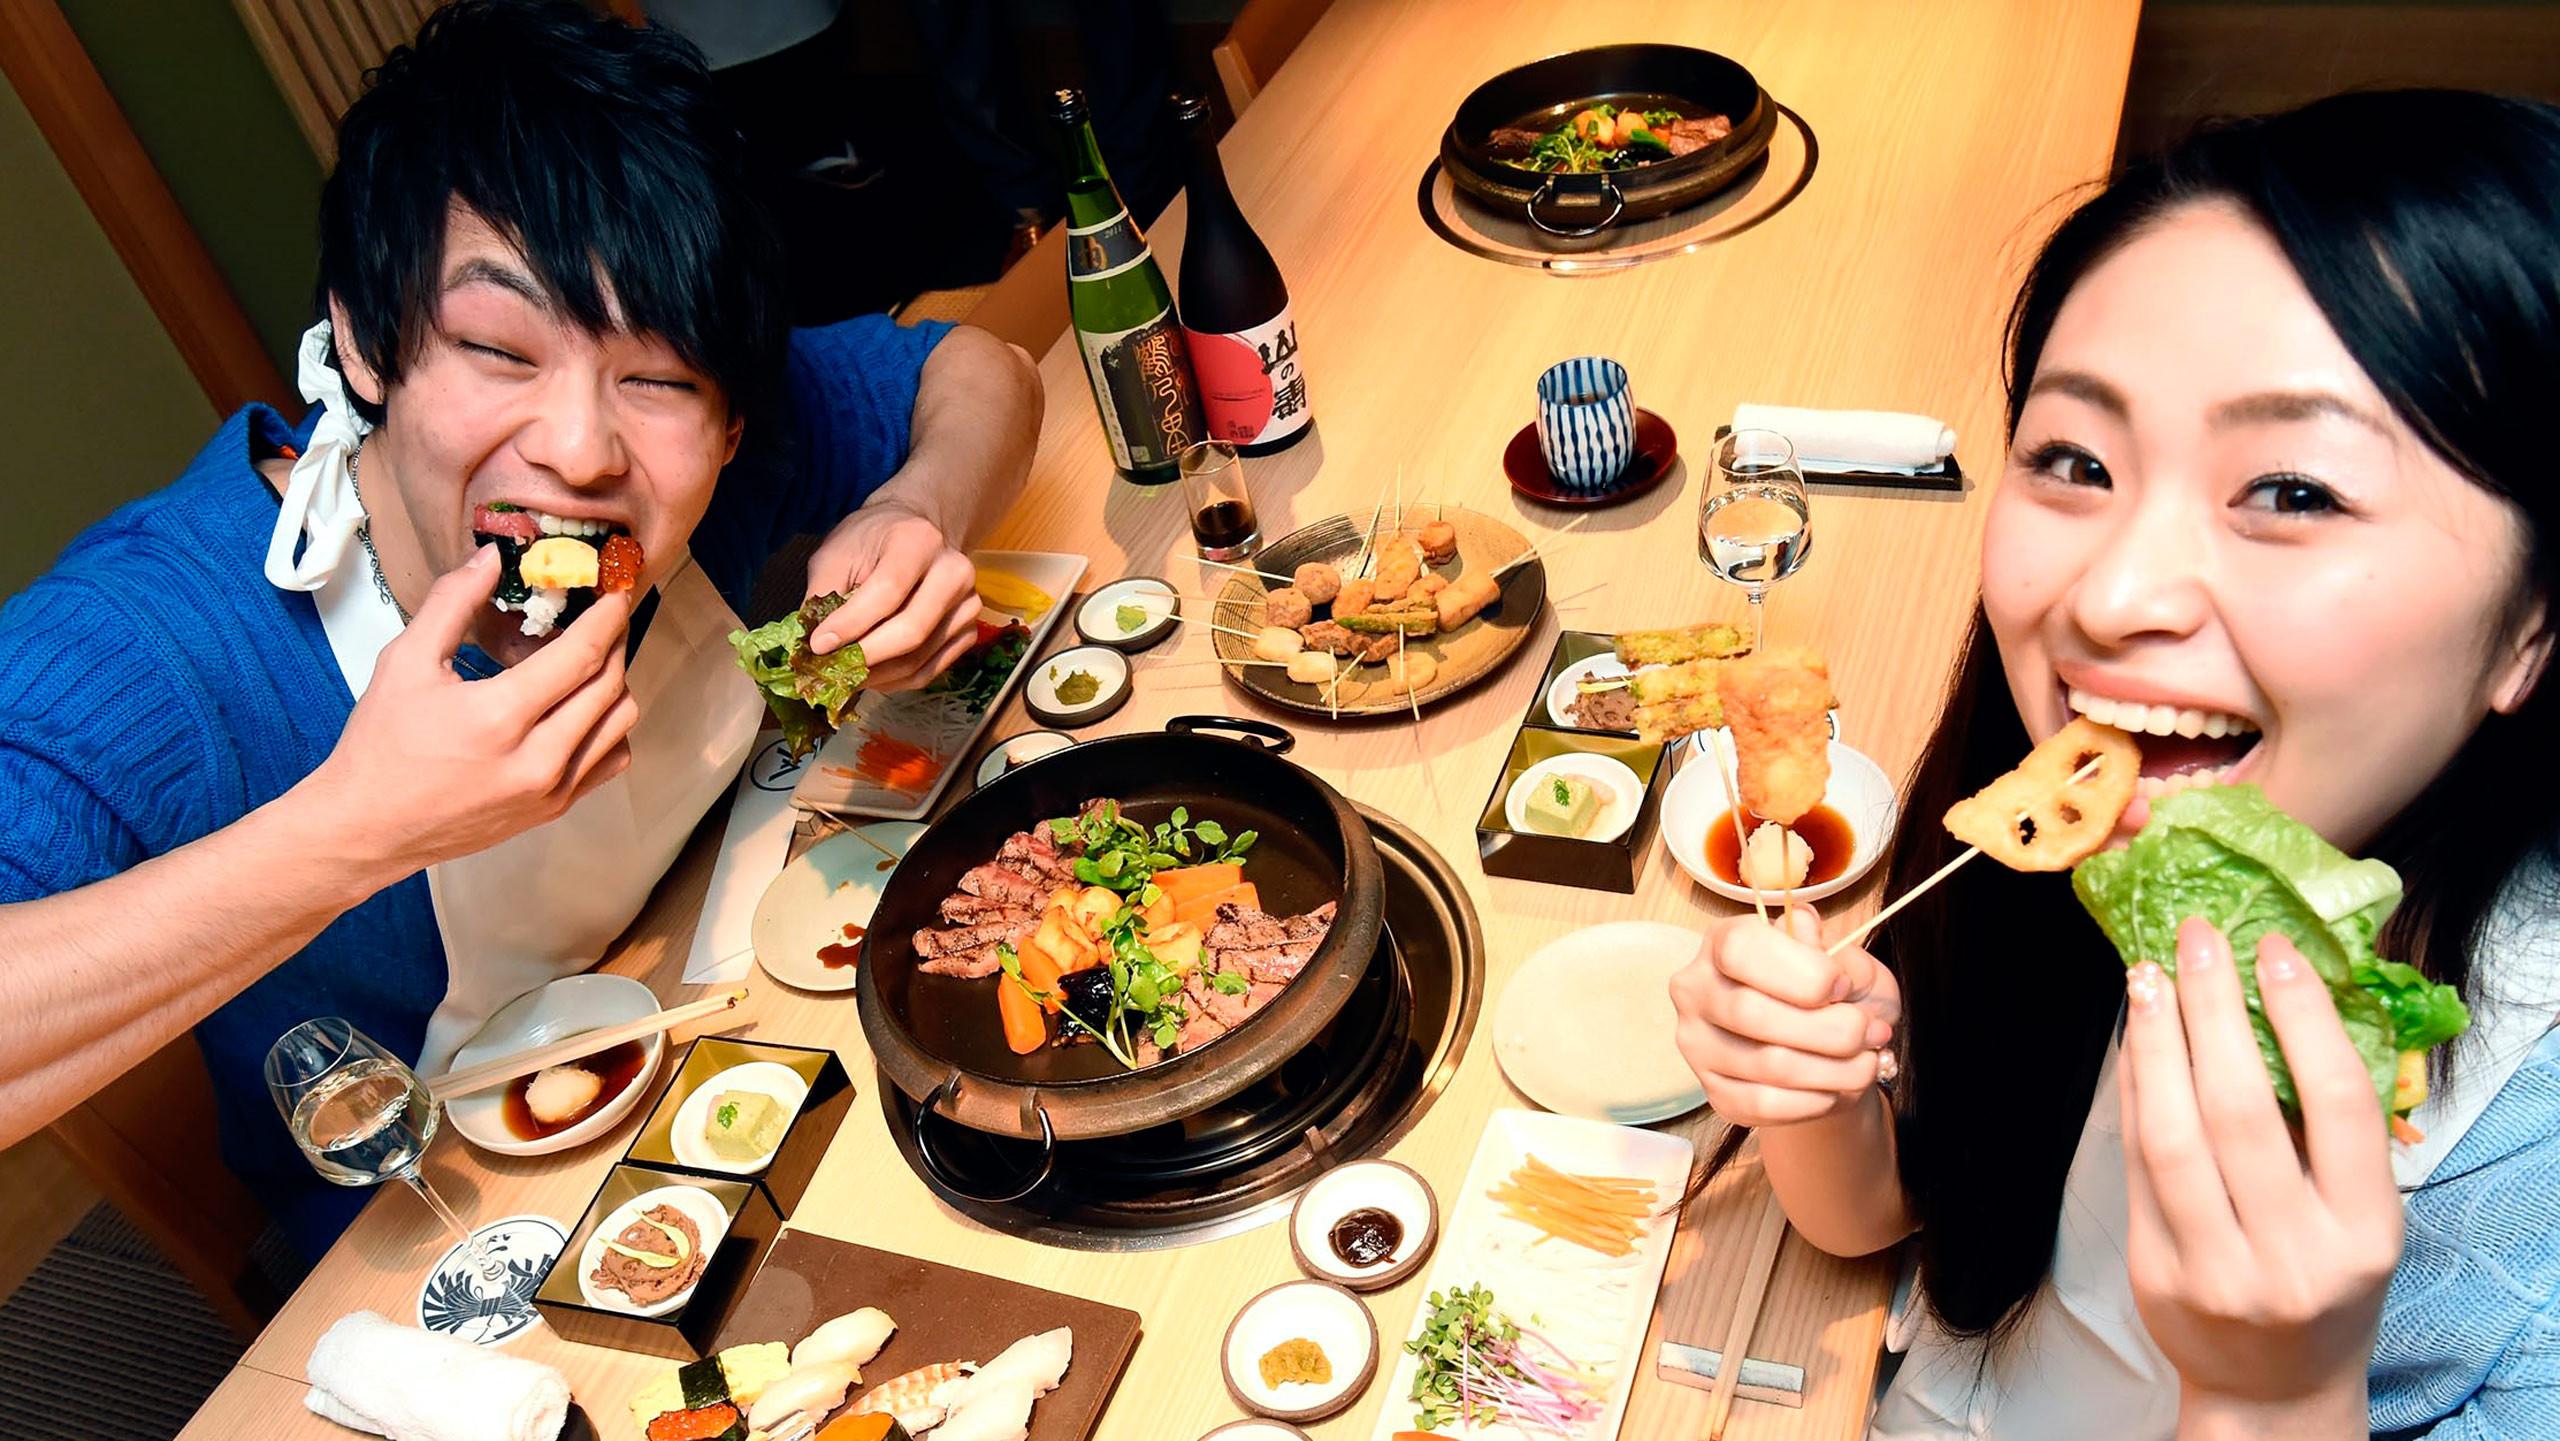 "<p>Фото: &copy;&nbsp;<a href=""https://www.flickr.com/photos/136397349@N04/25681029910/in/album-72157666205177556/"" target=""_blank"">flickr.com/JAPANKURU</a></p>"